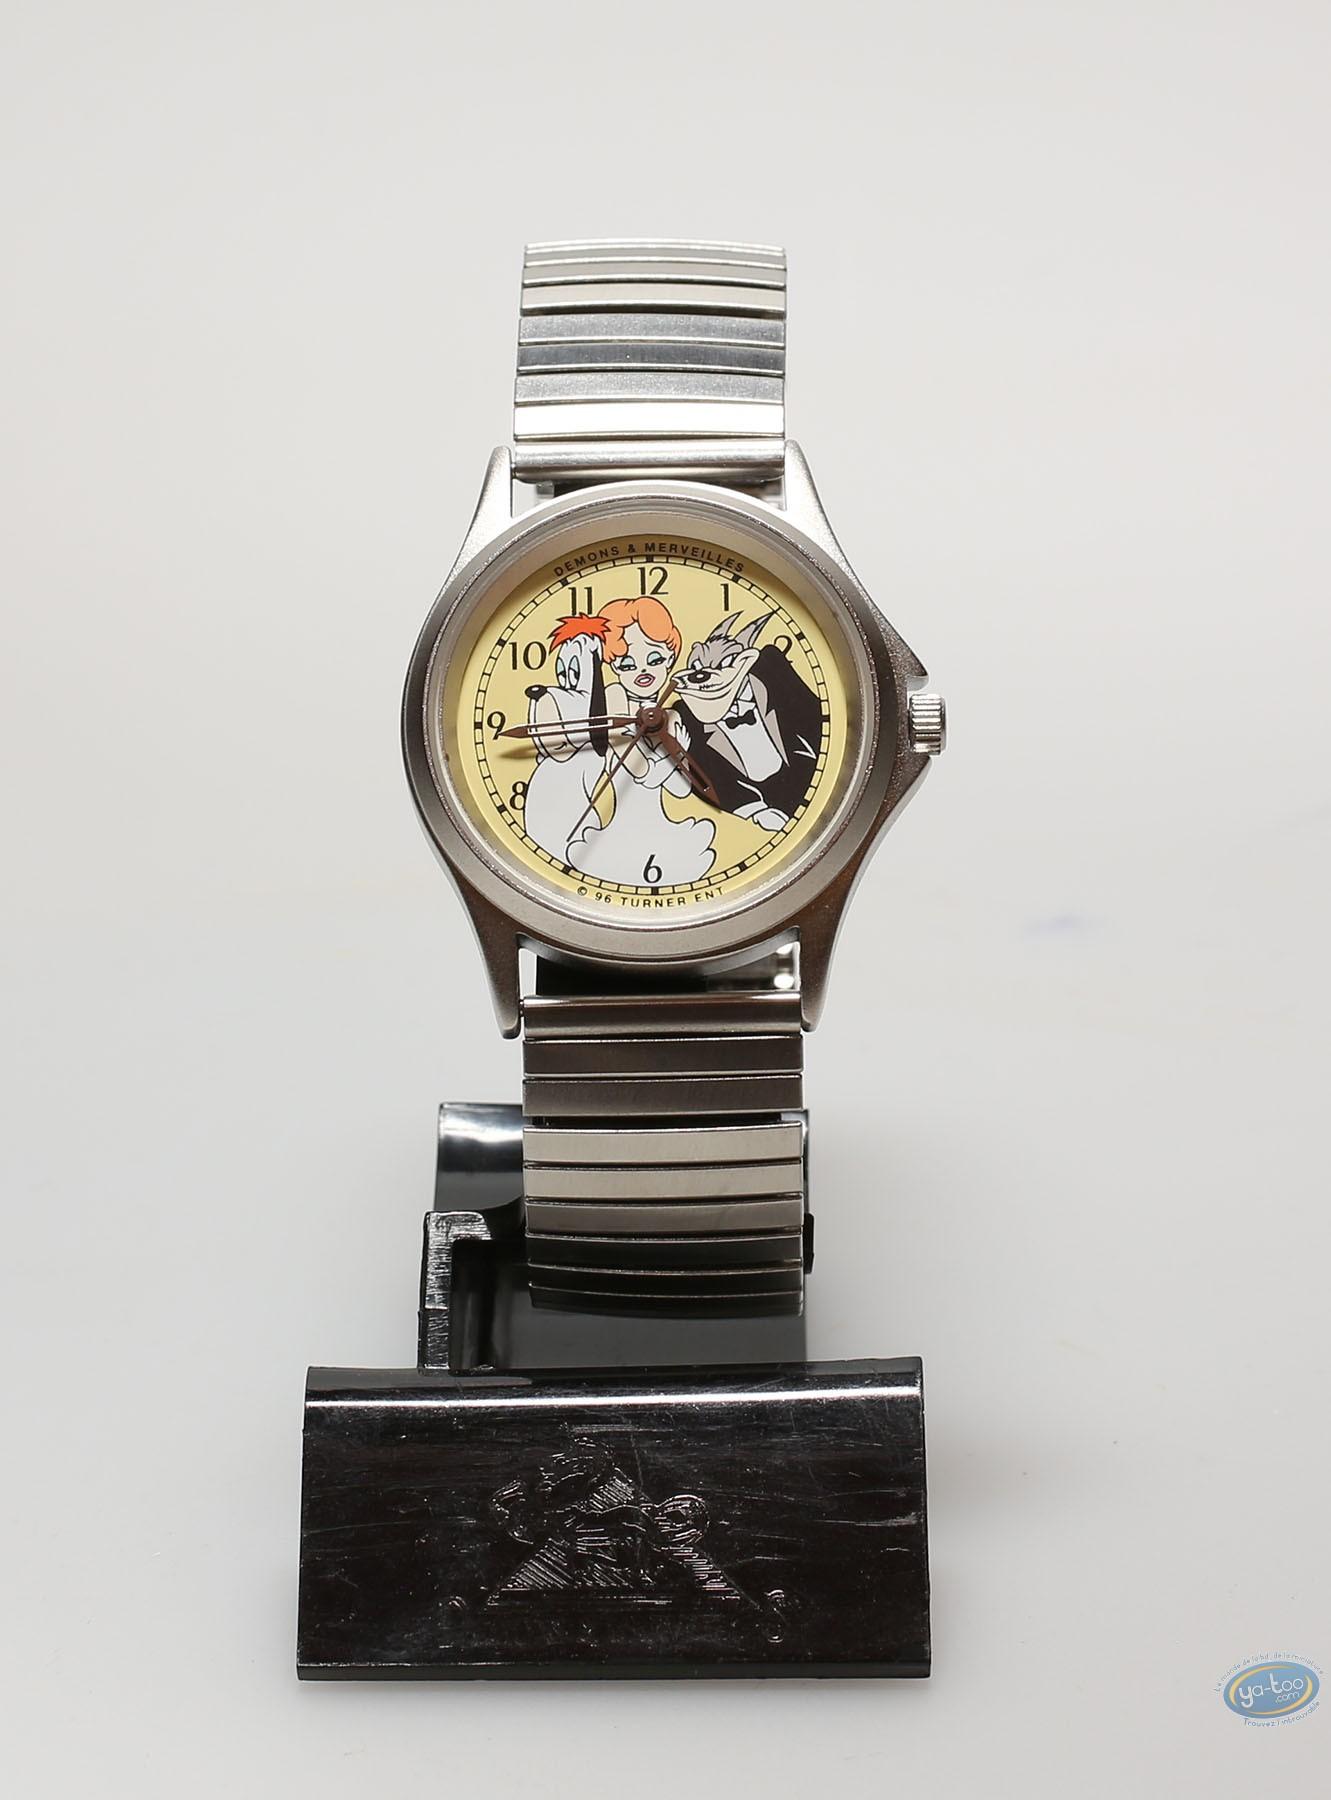 Clocks & Watches, Tex Avery : Watch, Tex Avery : metal strap